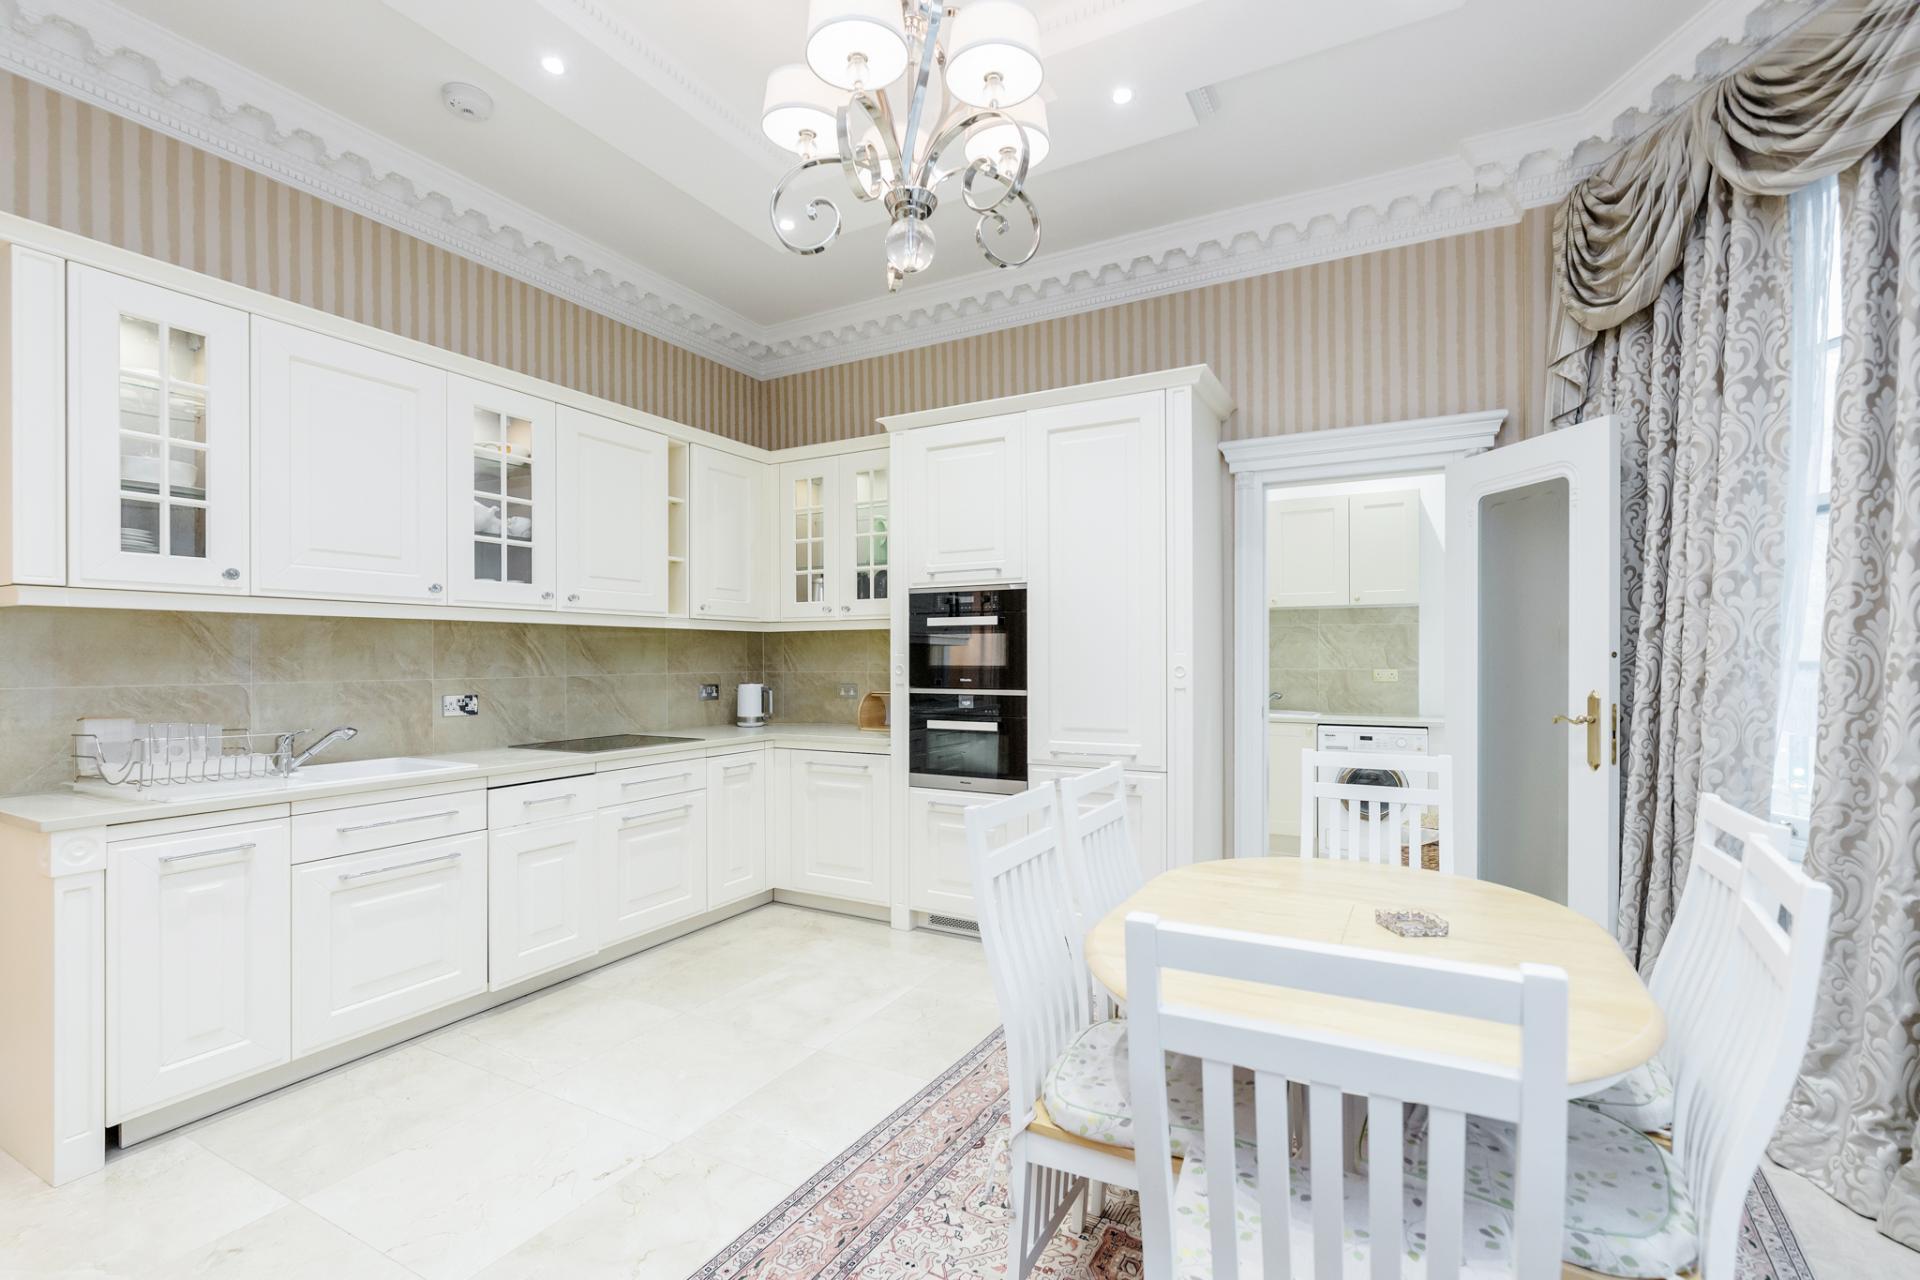 Kitchen at Hallway at Grosvenor Square Apartment, Mayfair, London